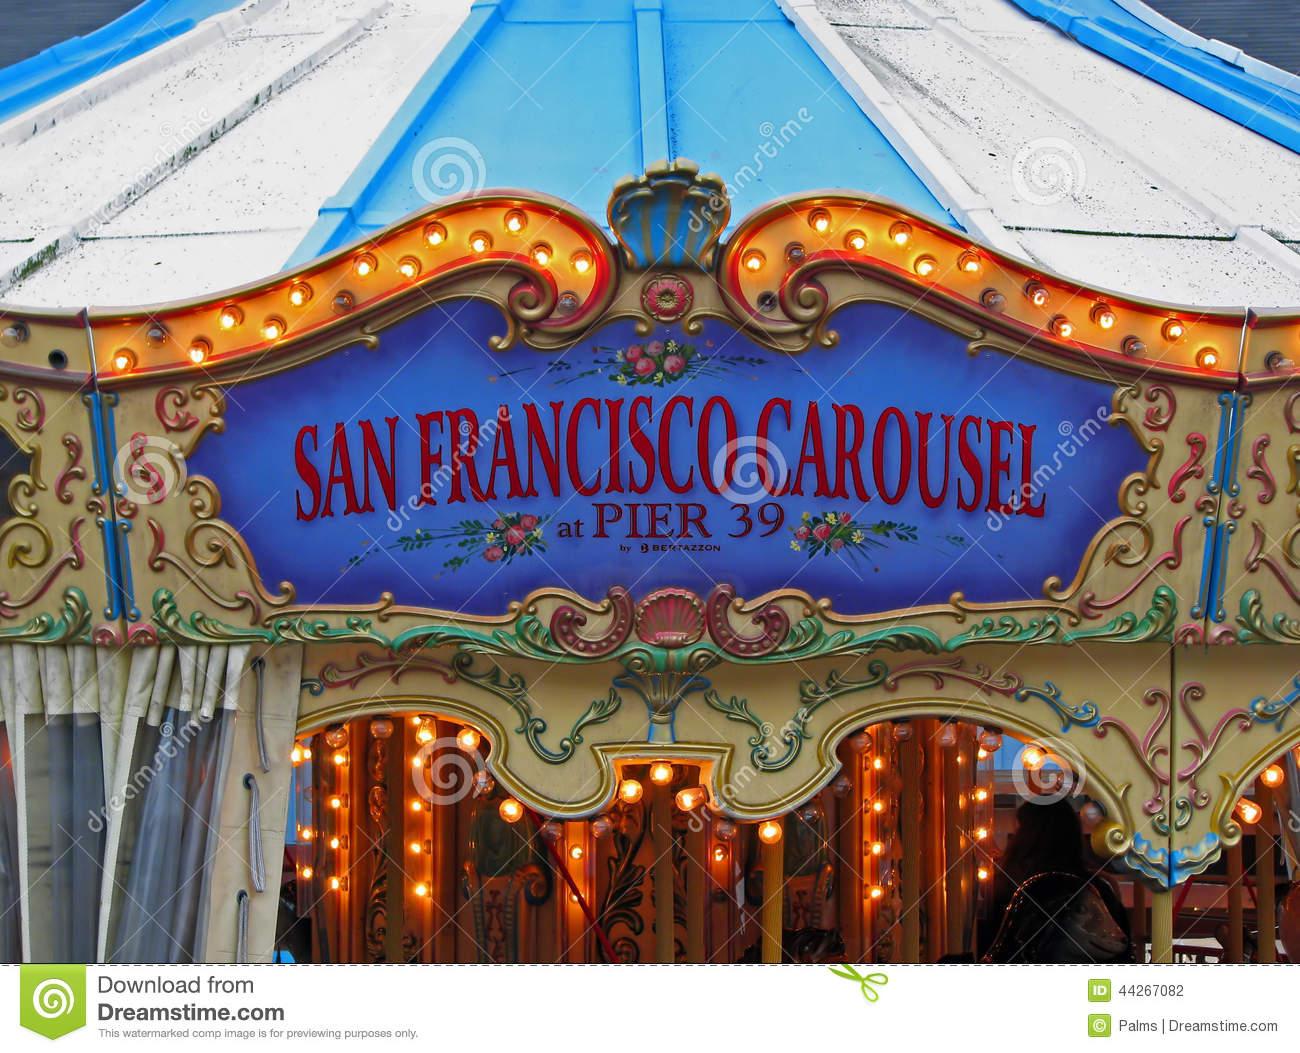 San Francisco Carousel Pier 39 Stock Photo.